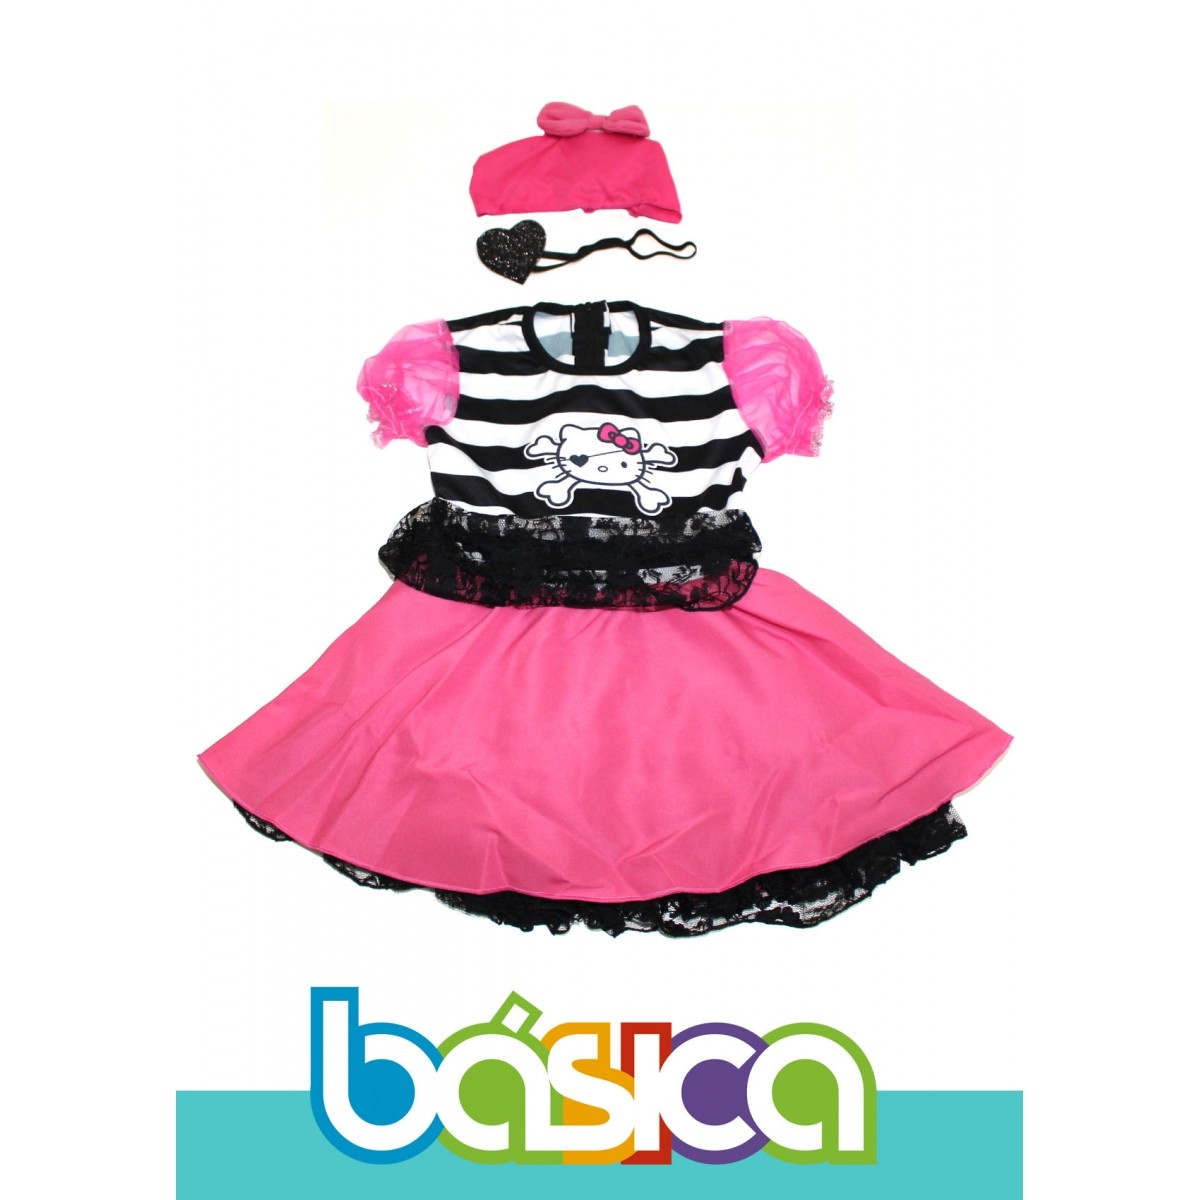 Fantasia de Pirata Hello Kitty Infantil Preto com Rosa, Bandana e Tapa Olho  - BÁSICA UNIFORMES